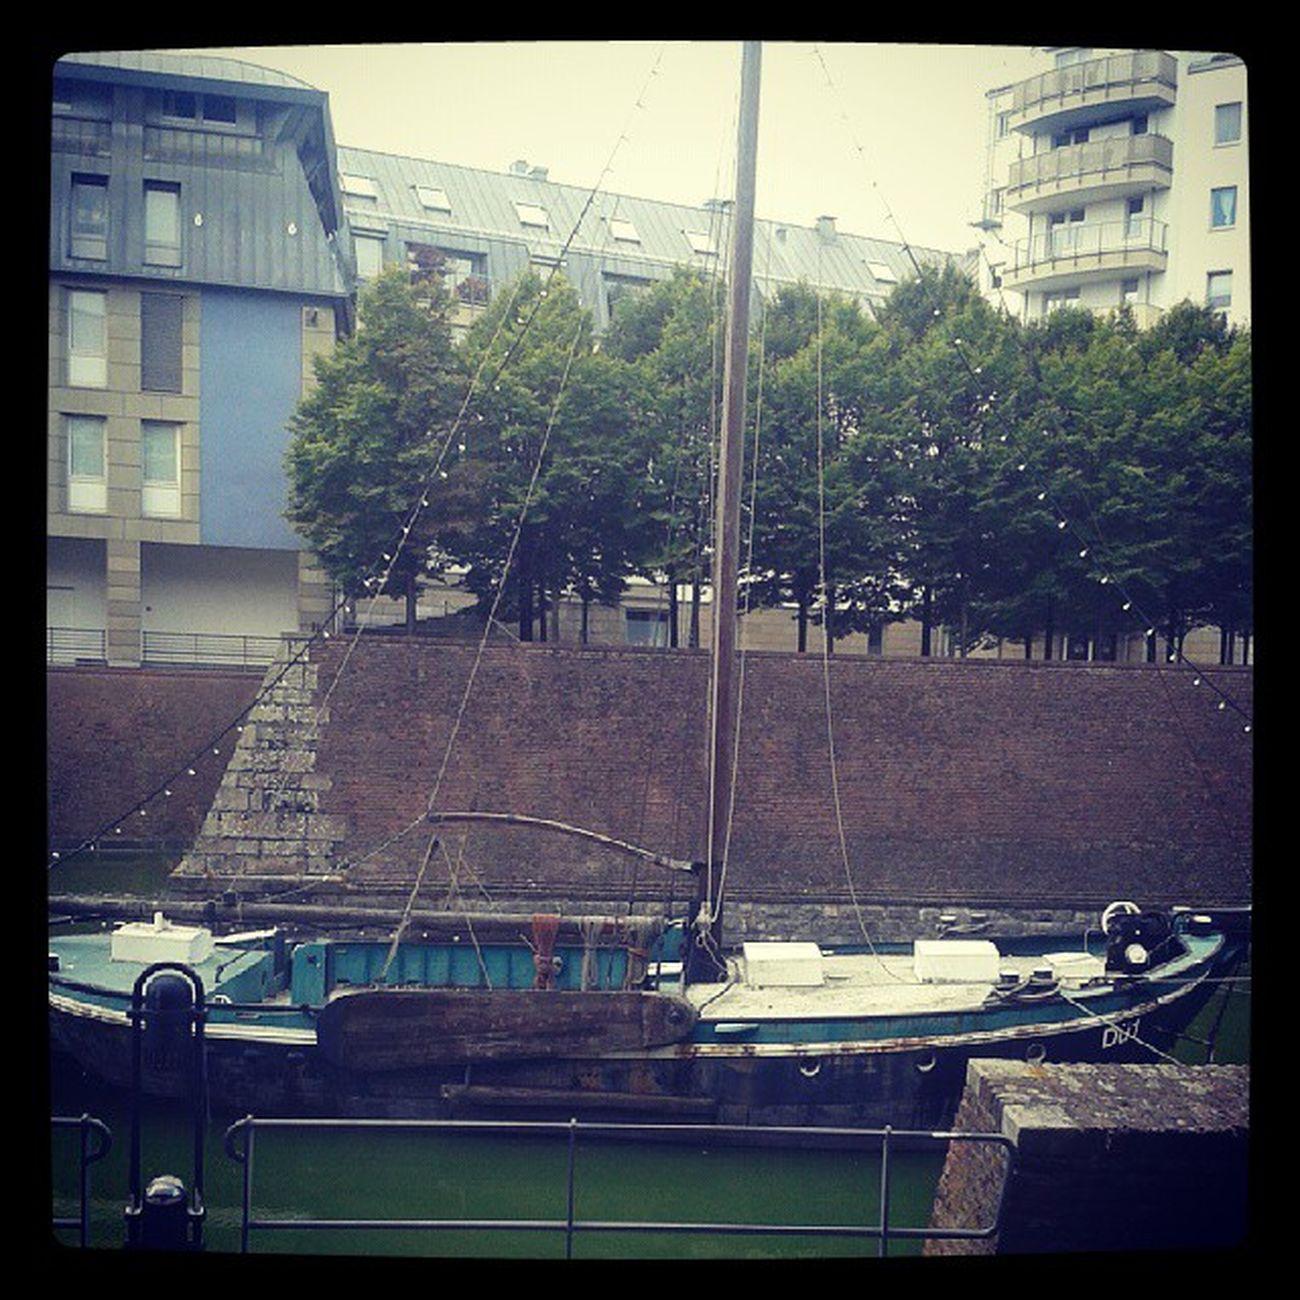 Aka3 wir segeln dann mal los!